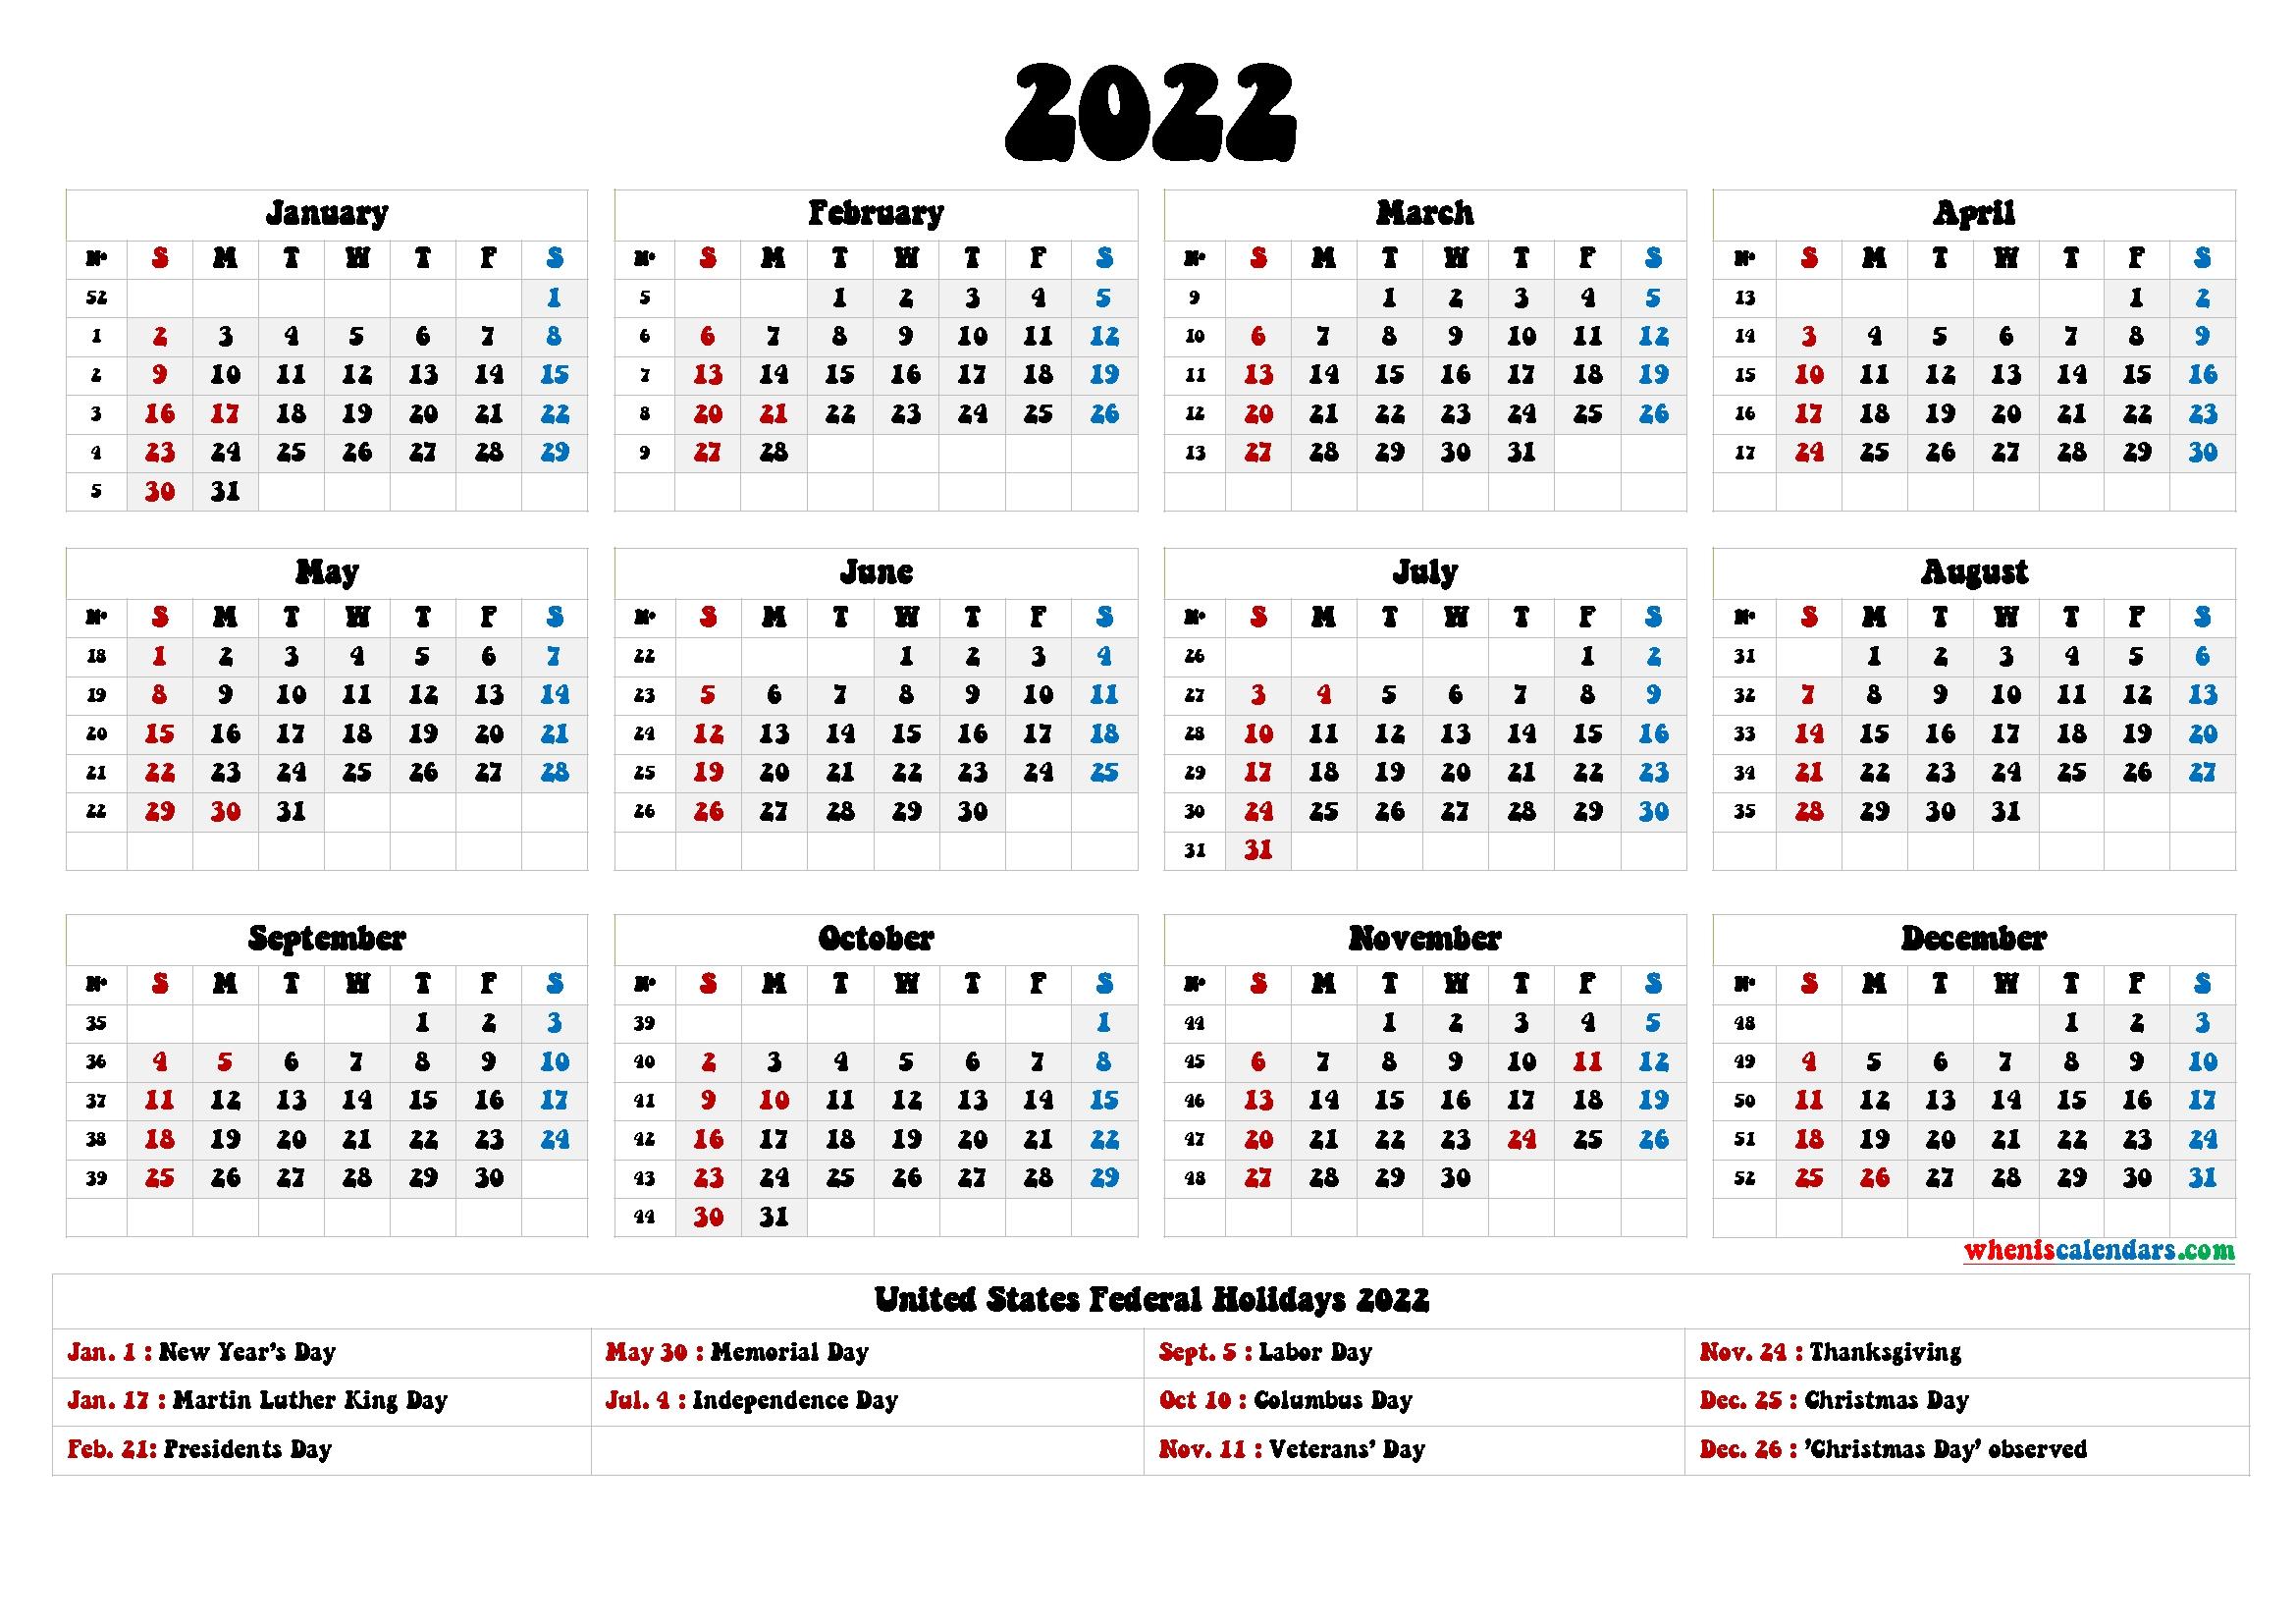 20 2022 Holidays Free Download Printable Calendar